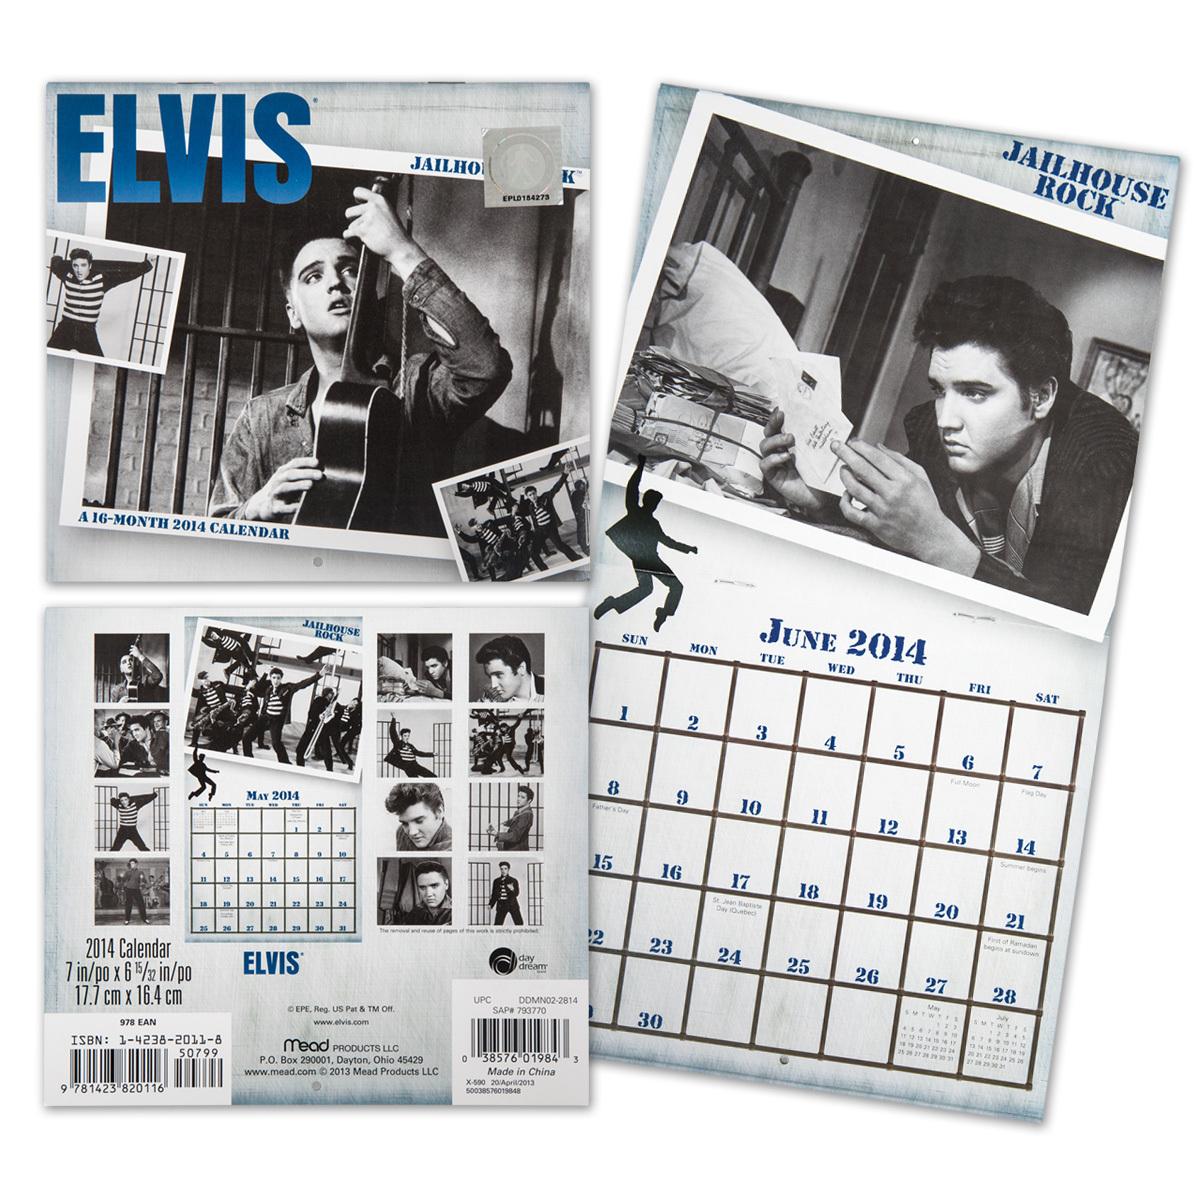 Elvis 2014 Jailhouse Rock Mini Wall Calendar